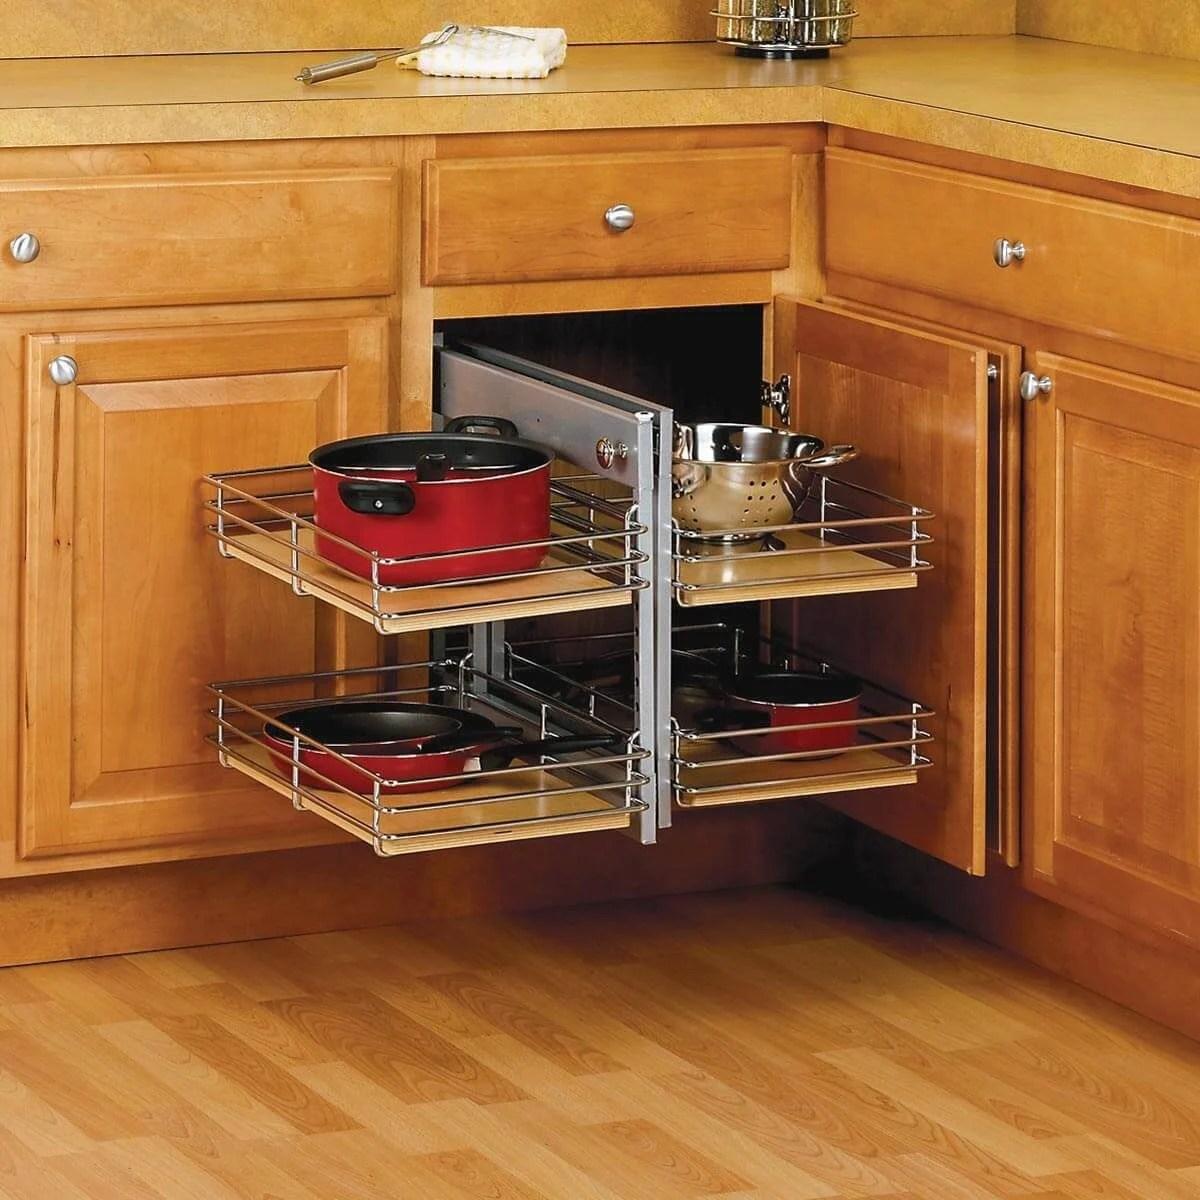 33 Ways To Revolutionize Your Kitchen Space Family Handyman